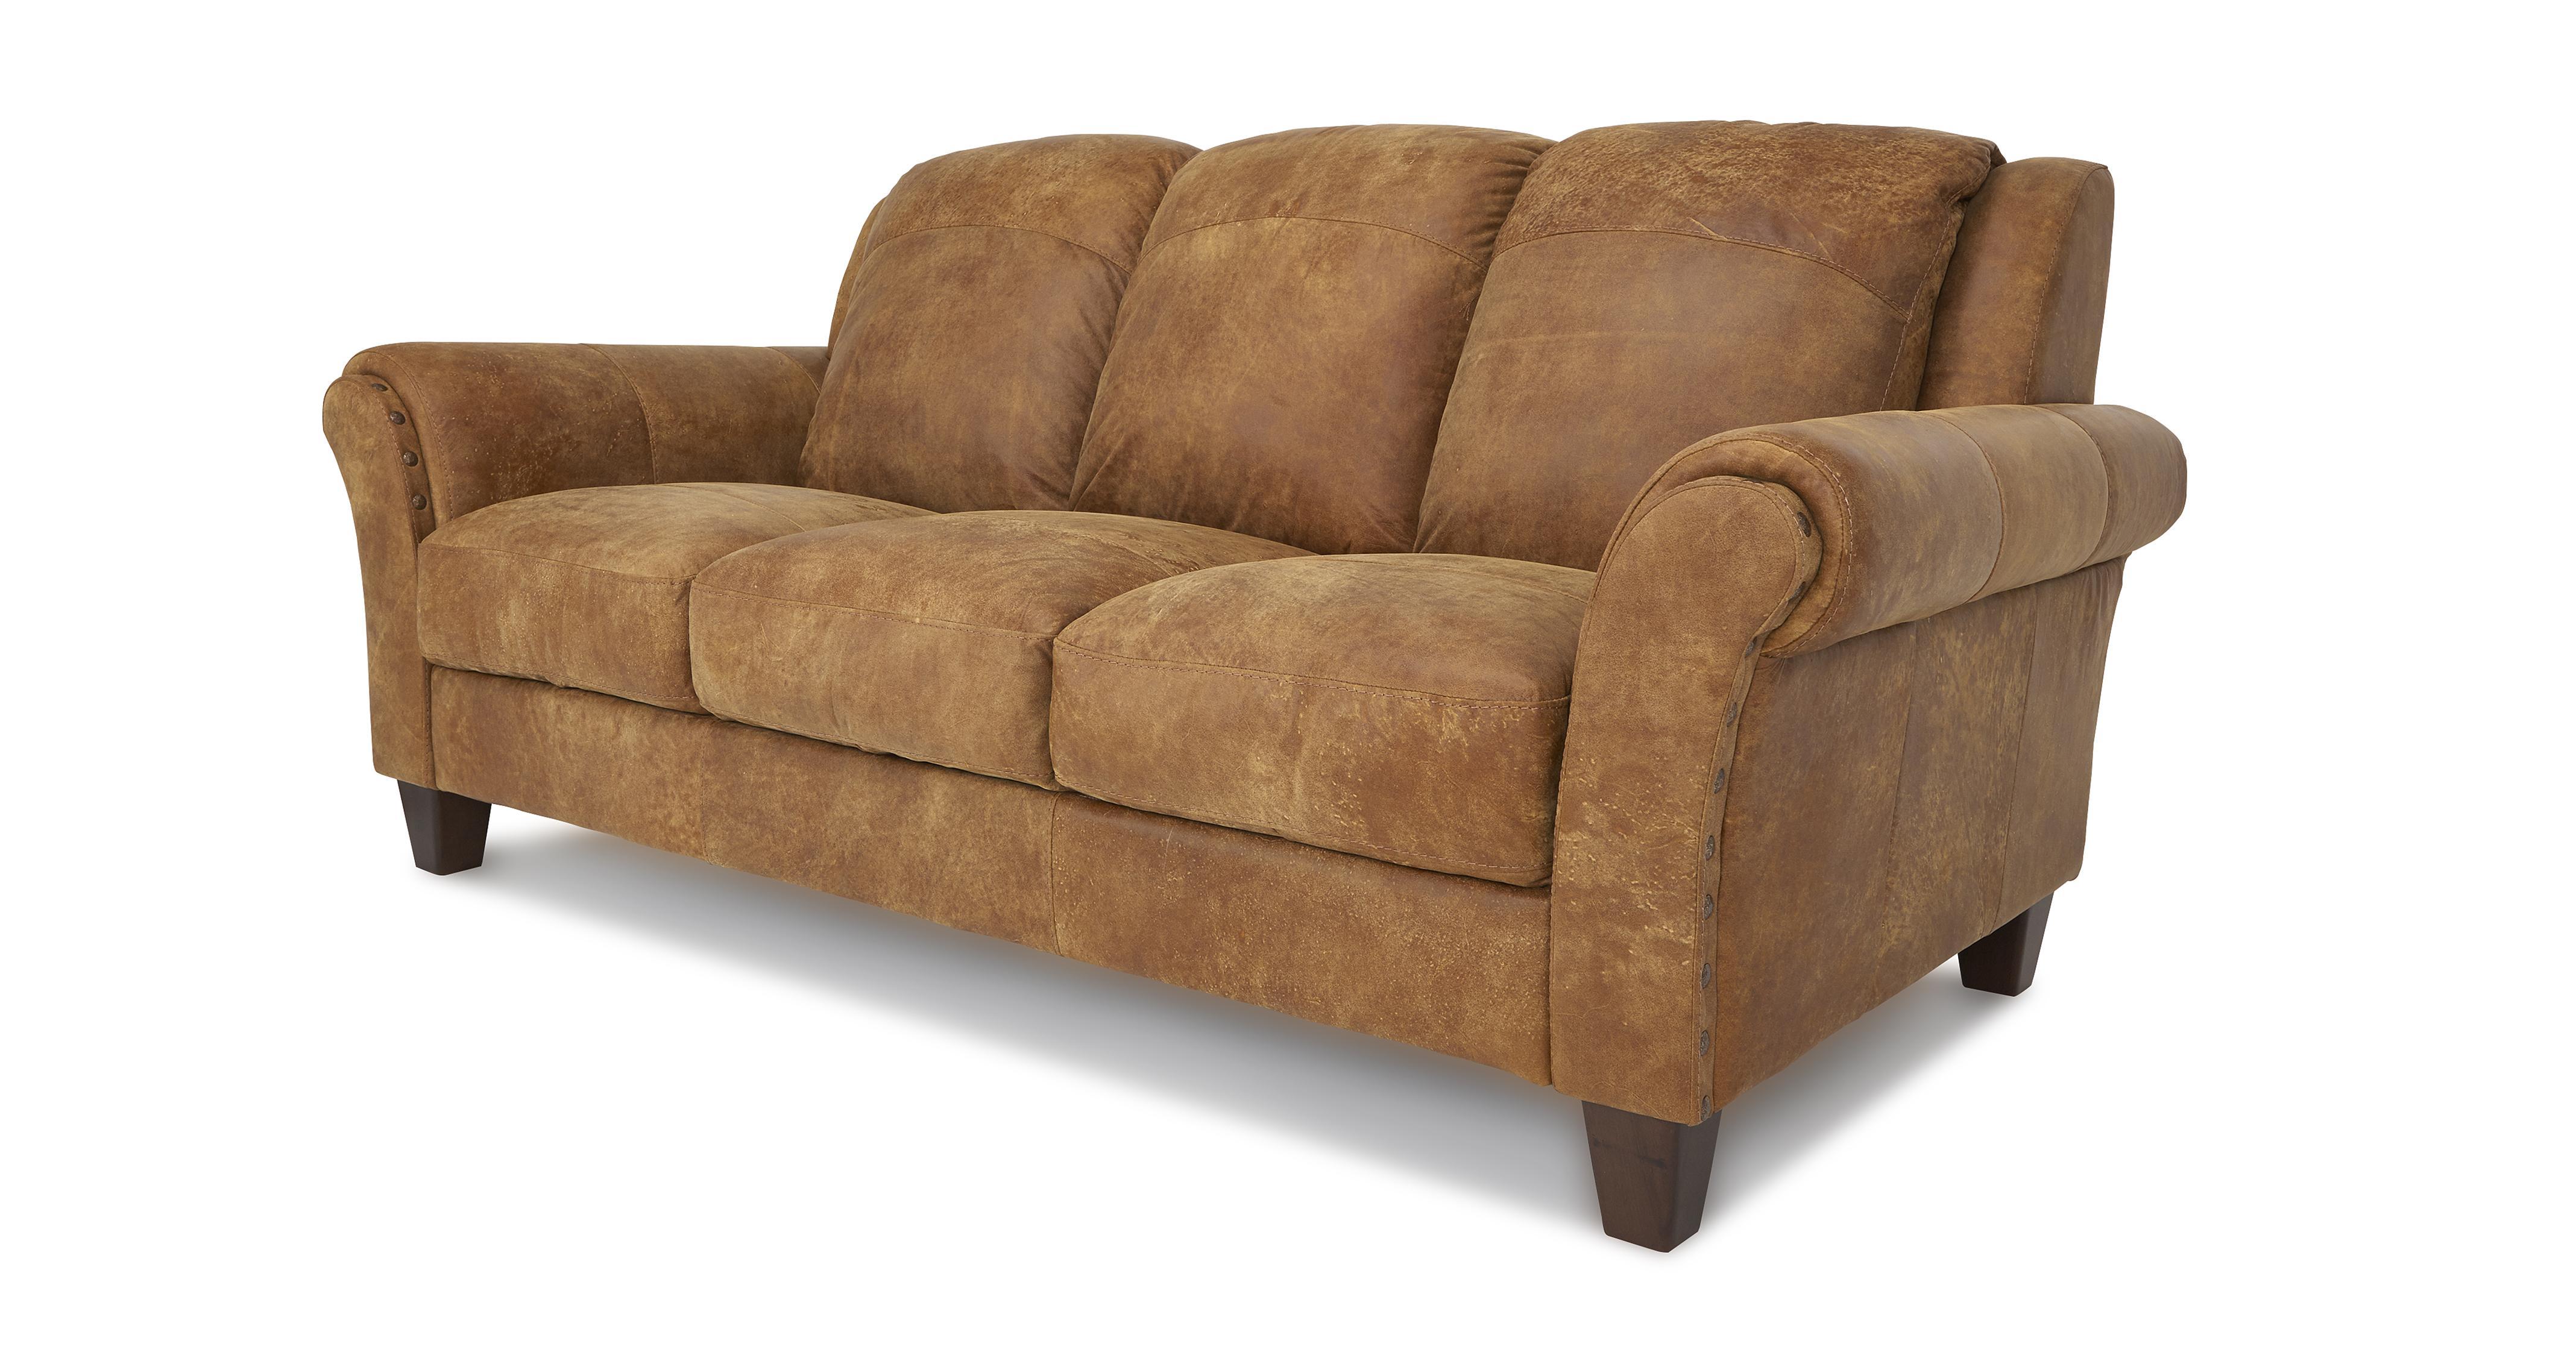 DFS Peyton Ranch Leather Sofa Set Inc 3 Seater, 2 Seater U0026 Storage Pouffe